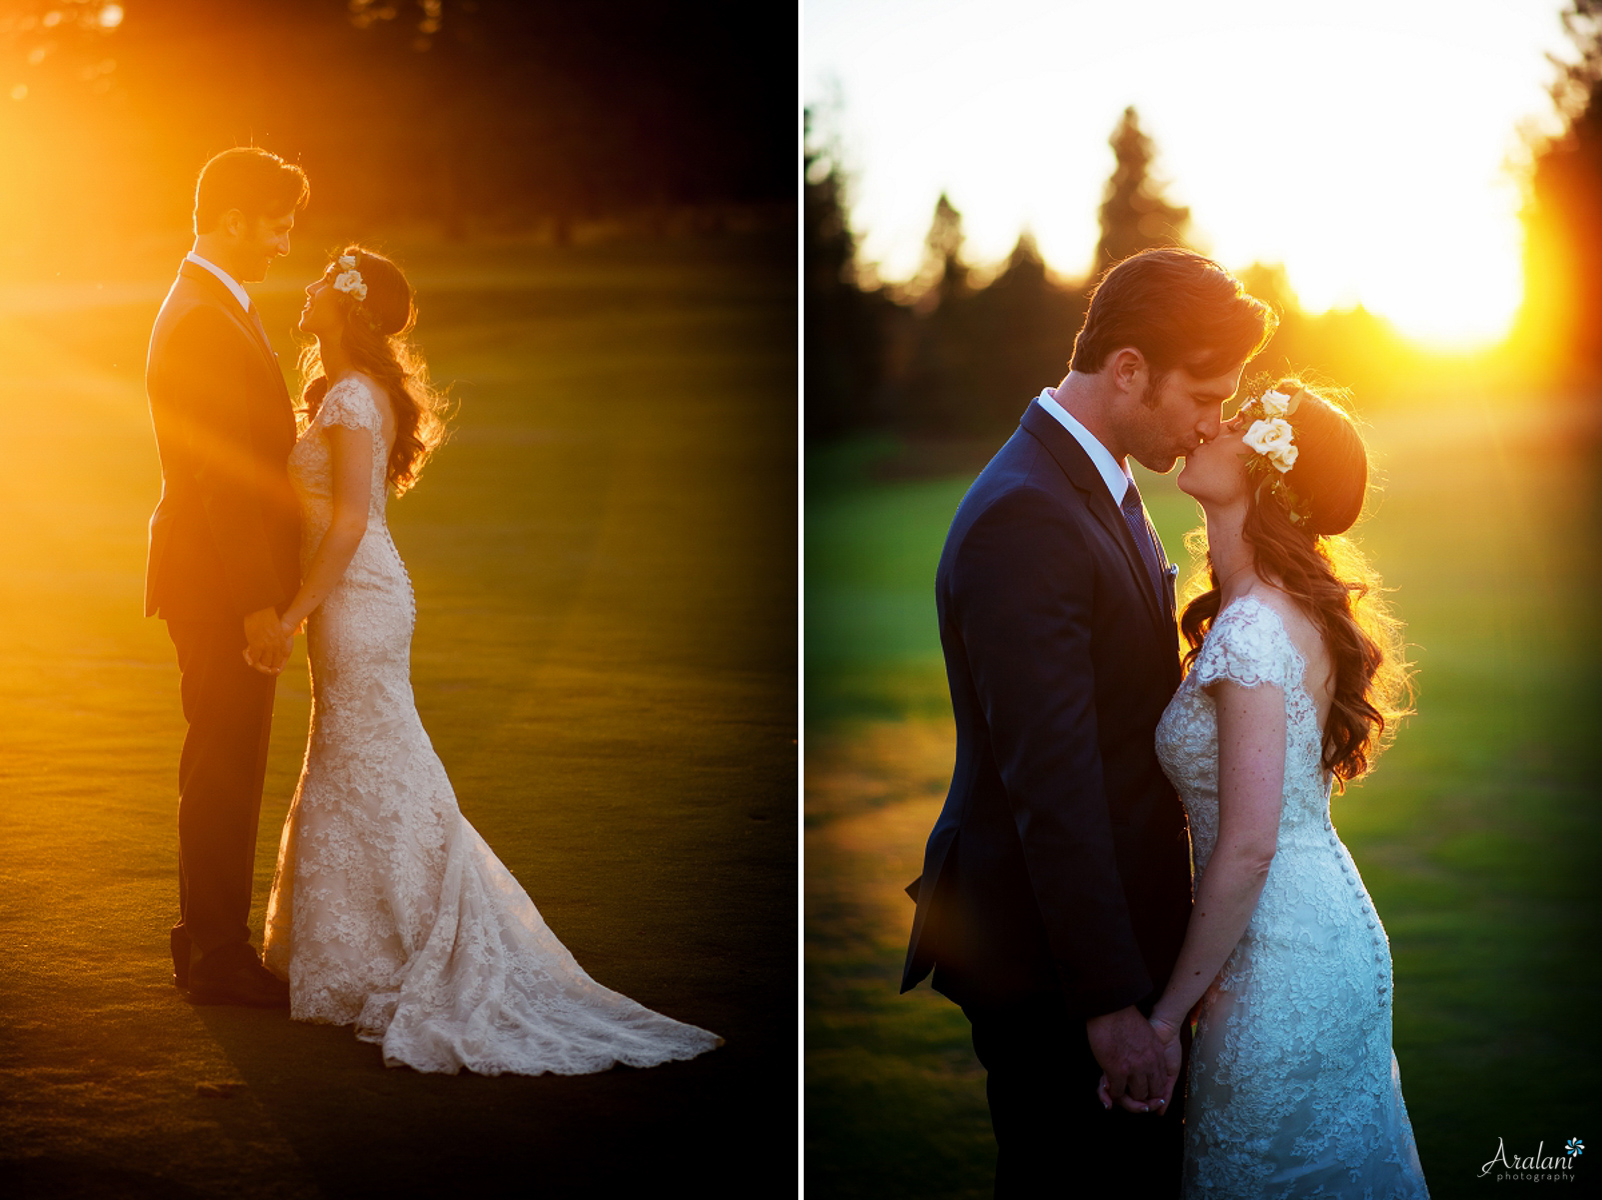 Aspen_Lakes_Golf_Course_Wedding_KG0031.jpg